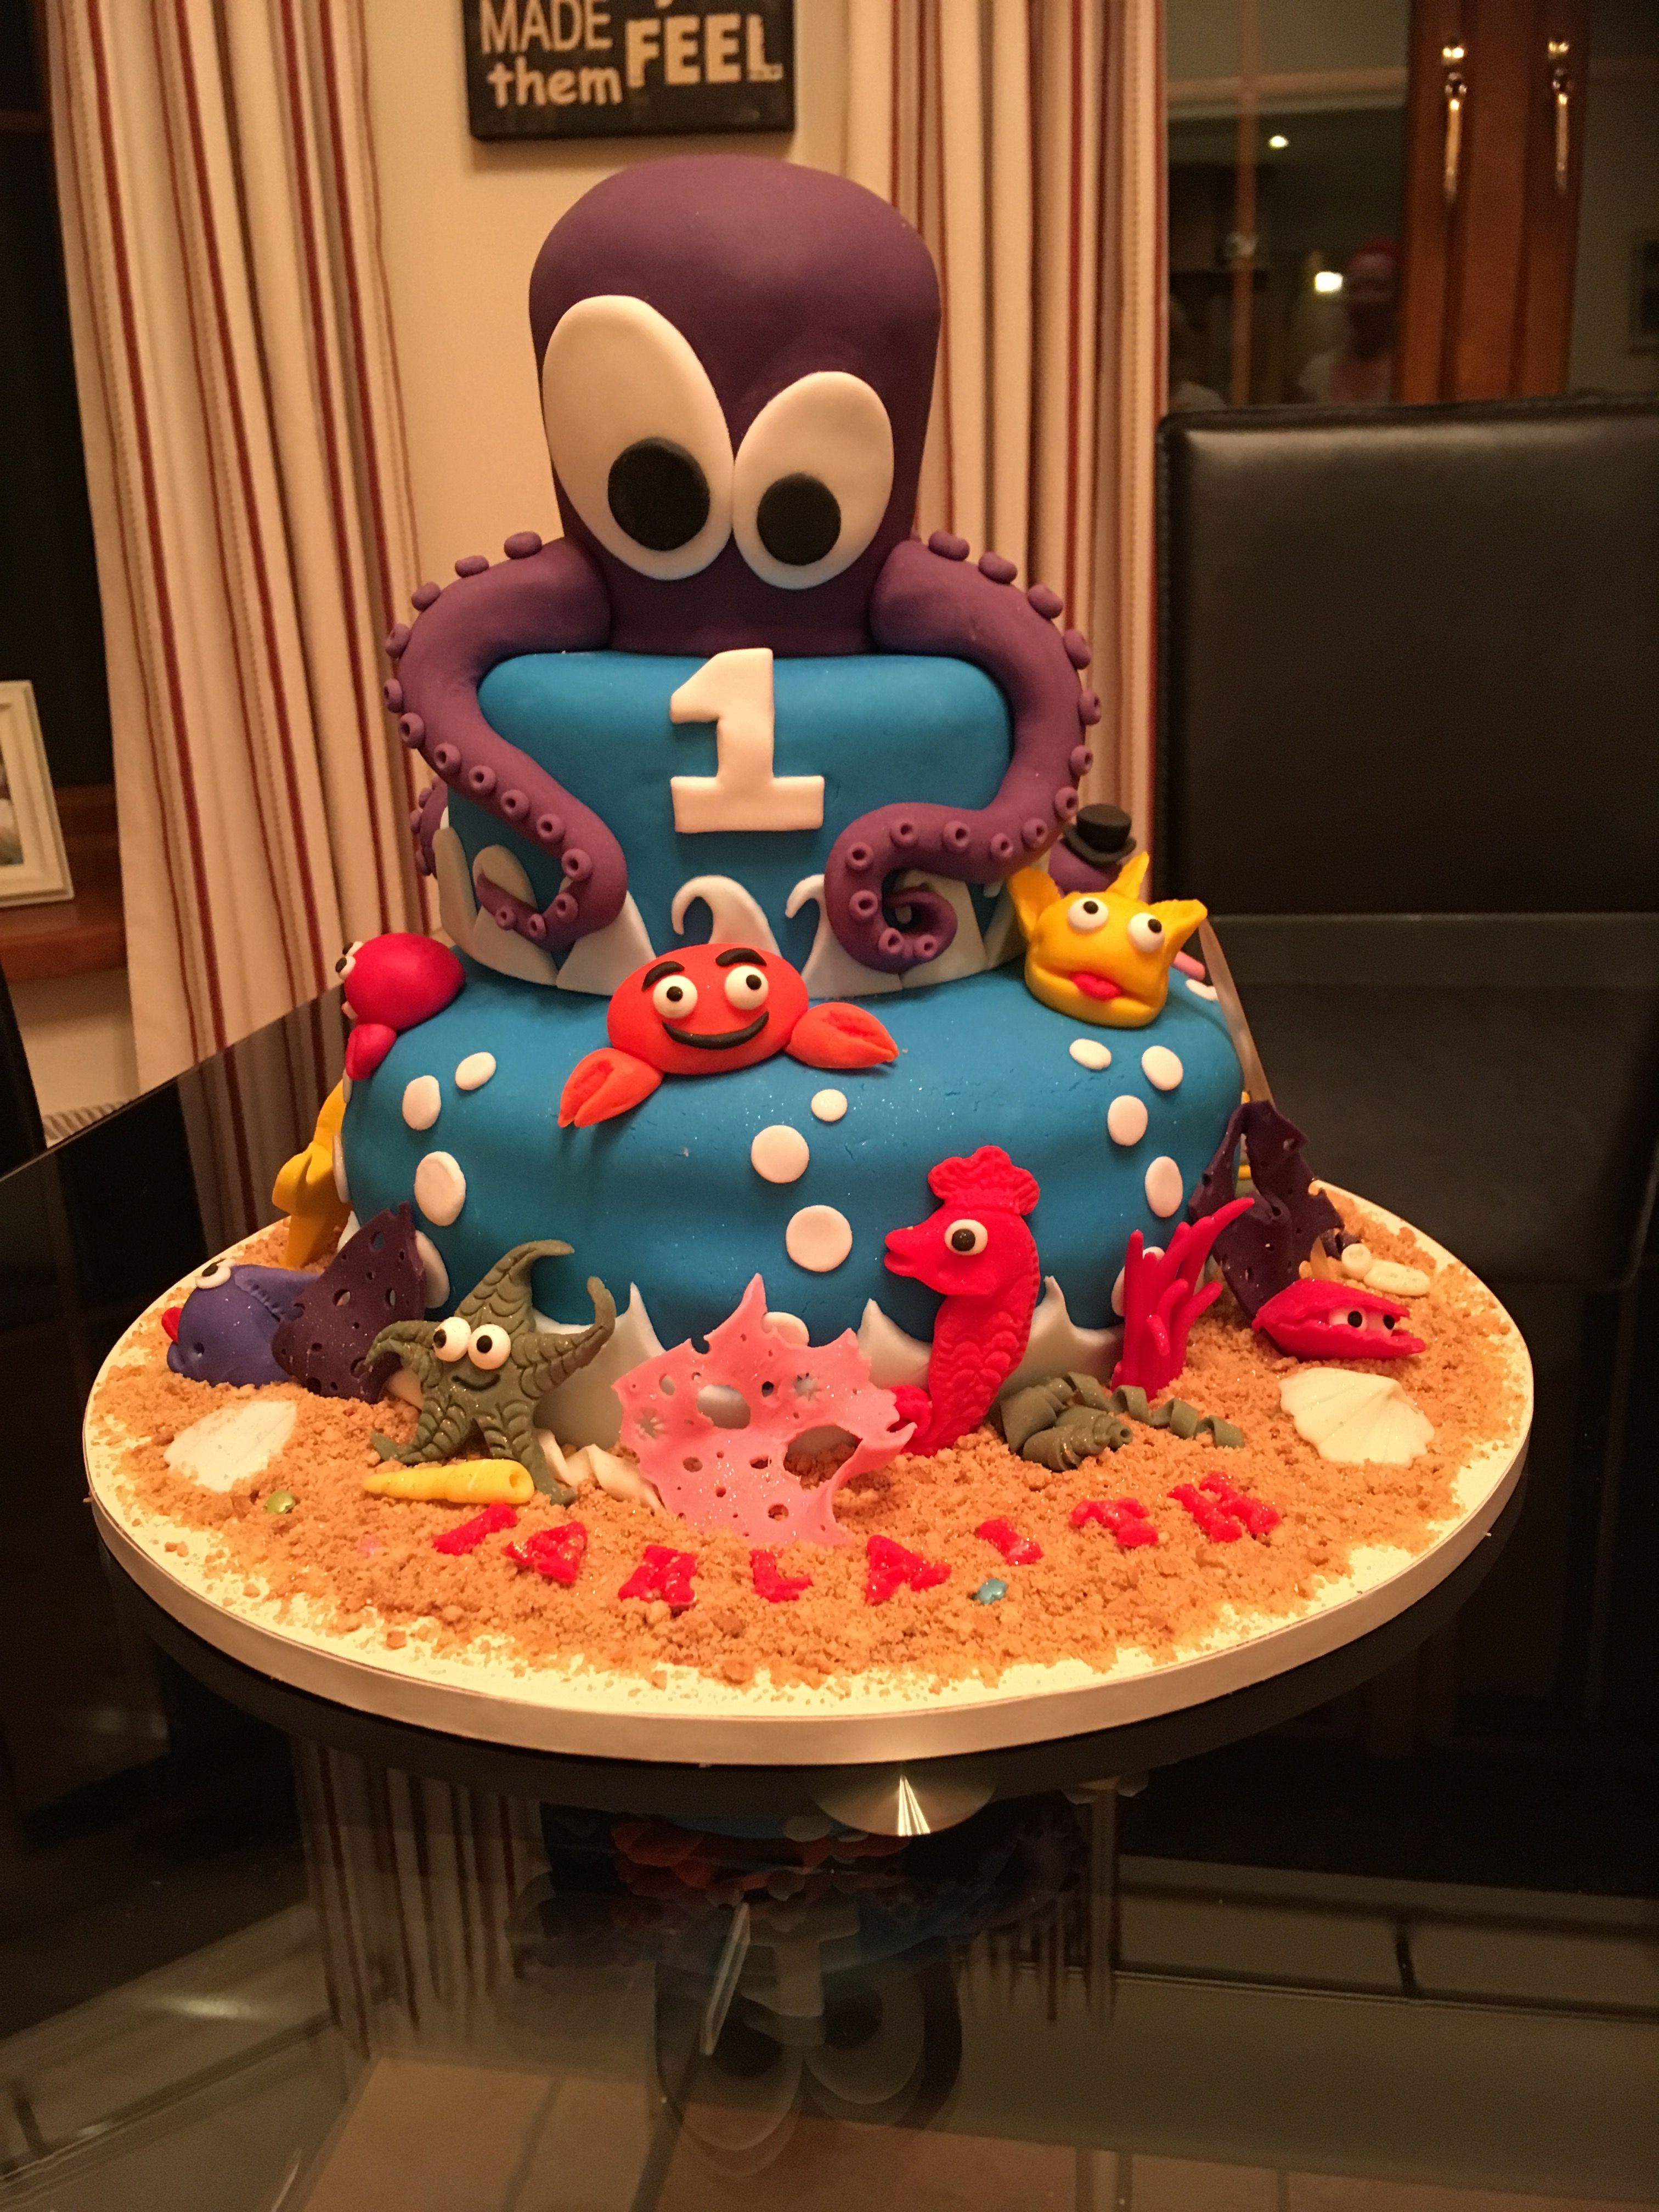 Pin by karen rouine on birthday party birthday cake